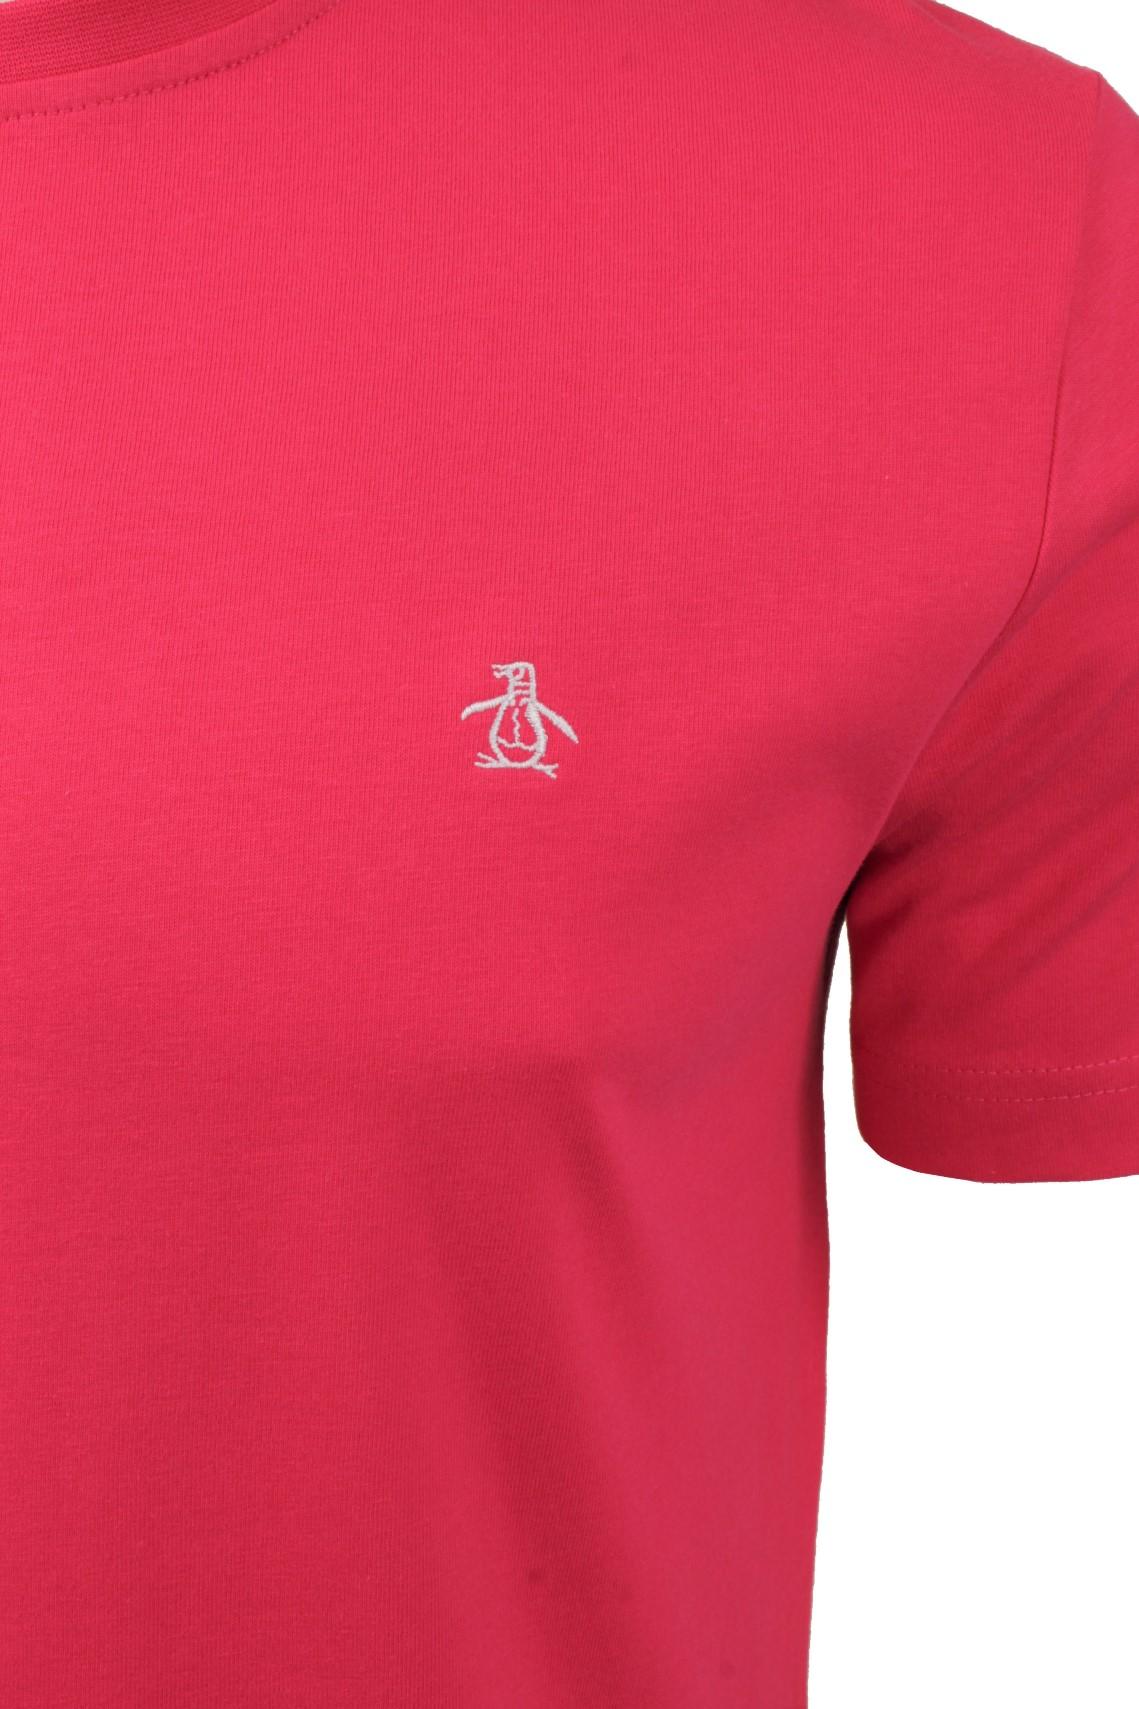 Mens-T-Shirt-by-Original-Penguin-Crew-Neck-Short-Sleeved thumbnail 40